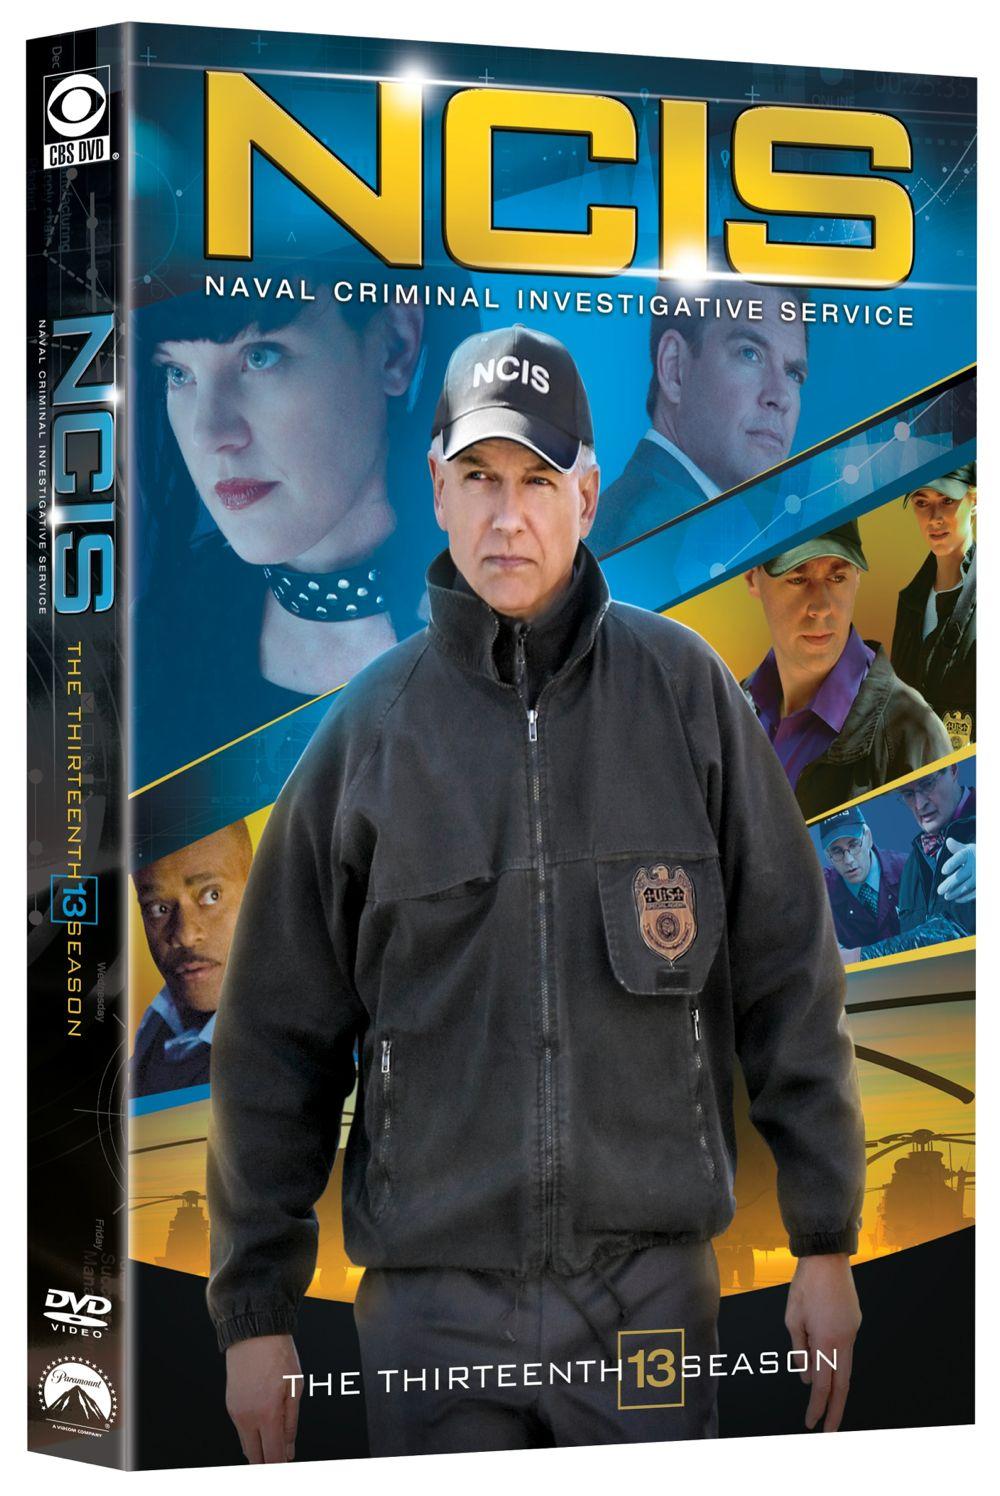 NCIS Season 13 DVD Cover 3D